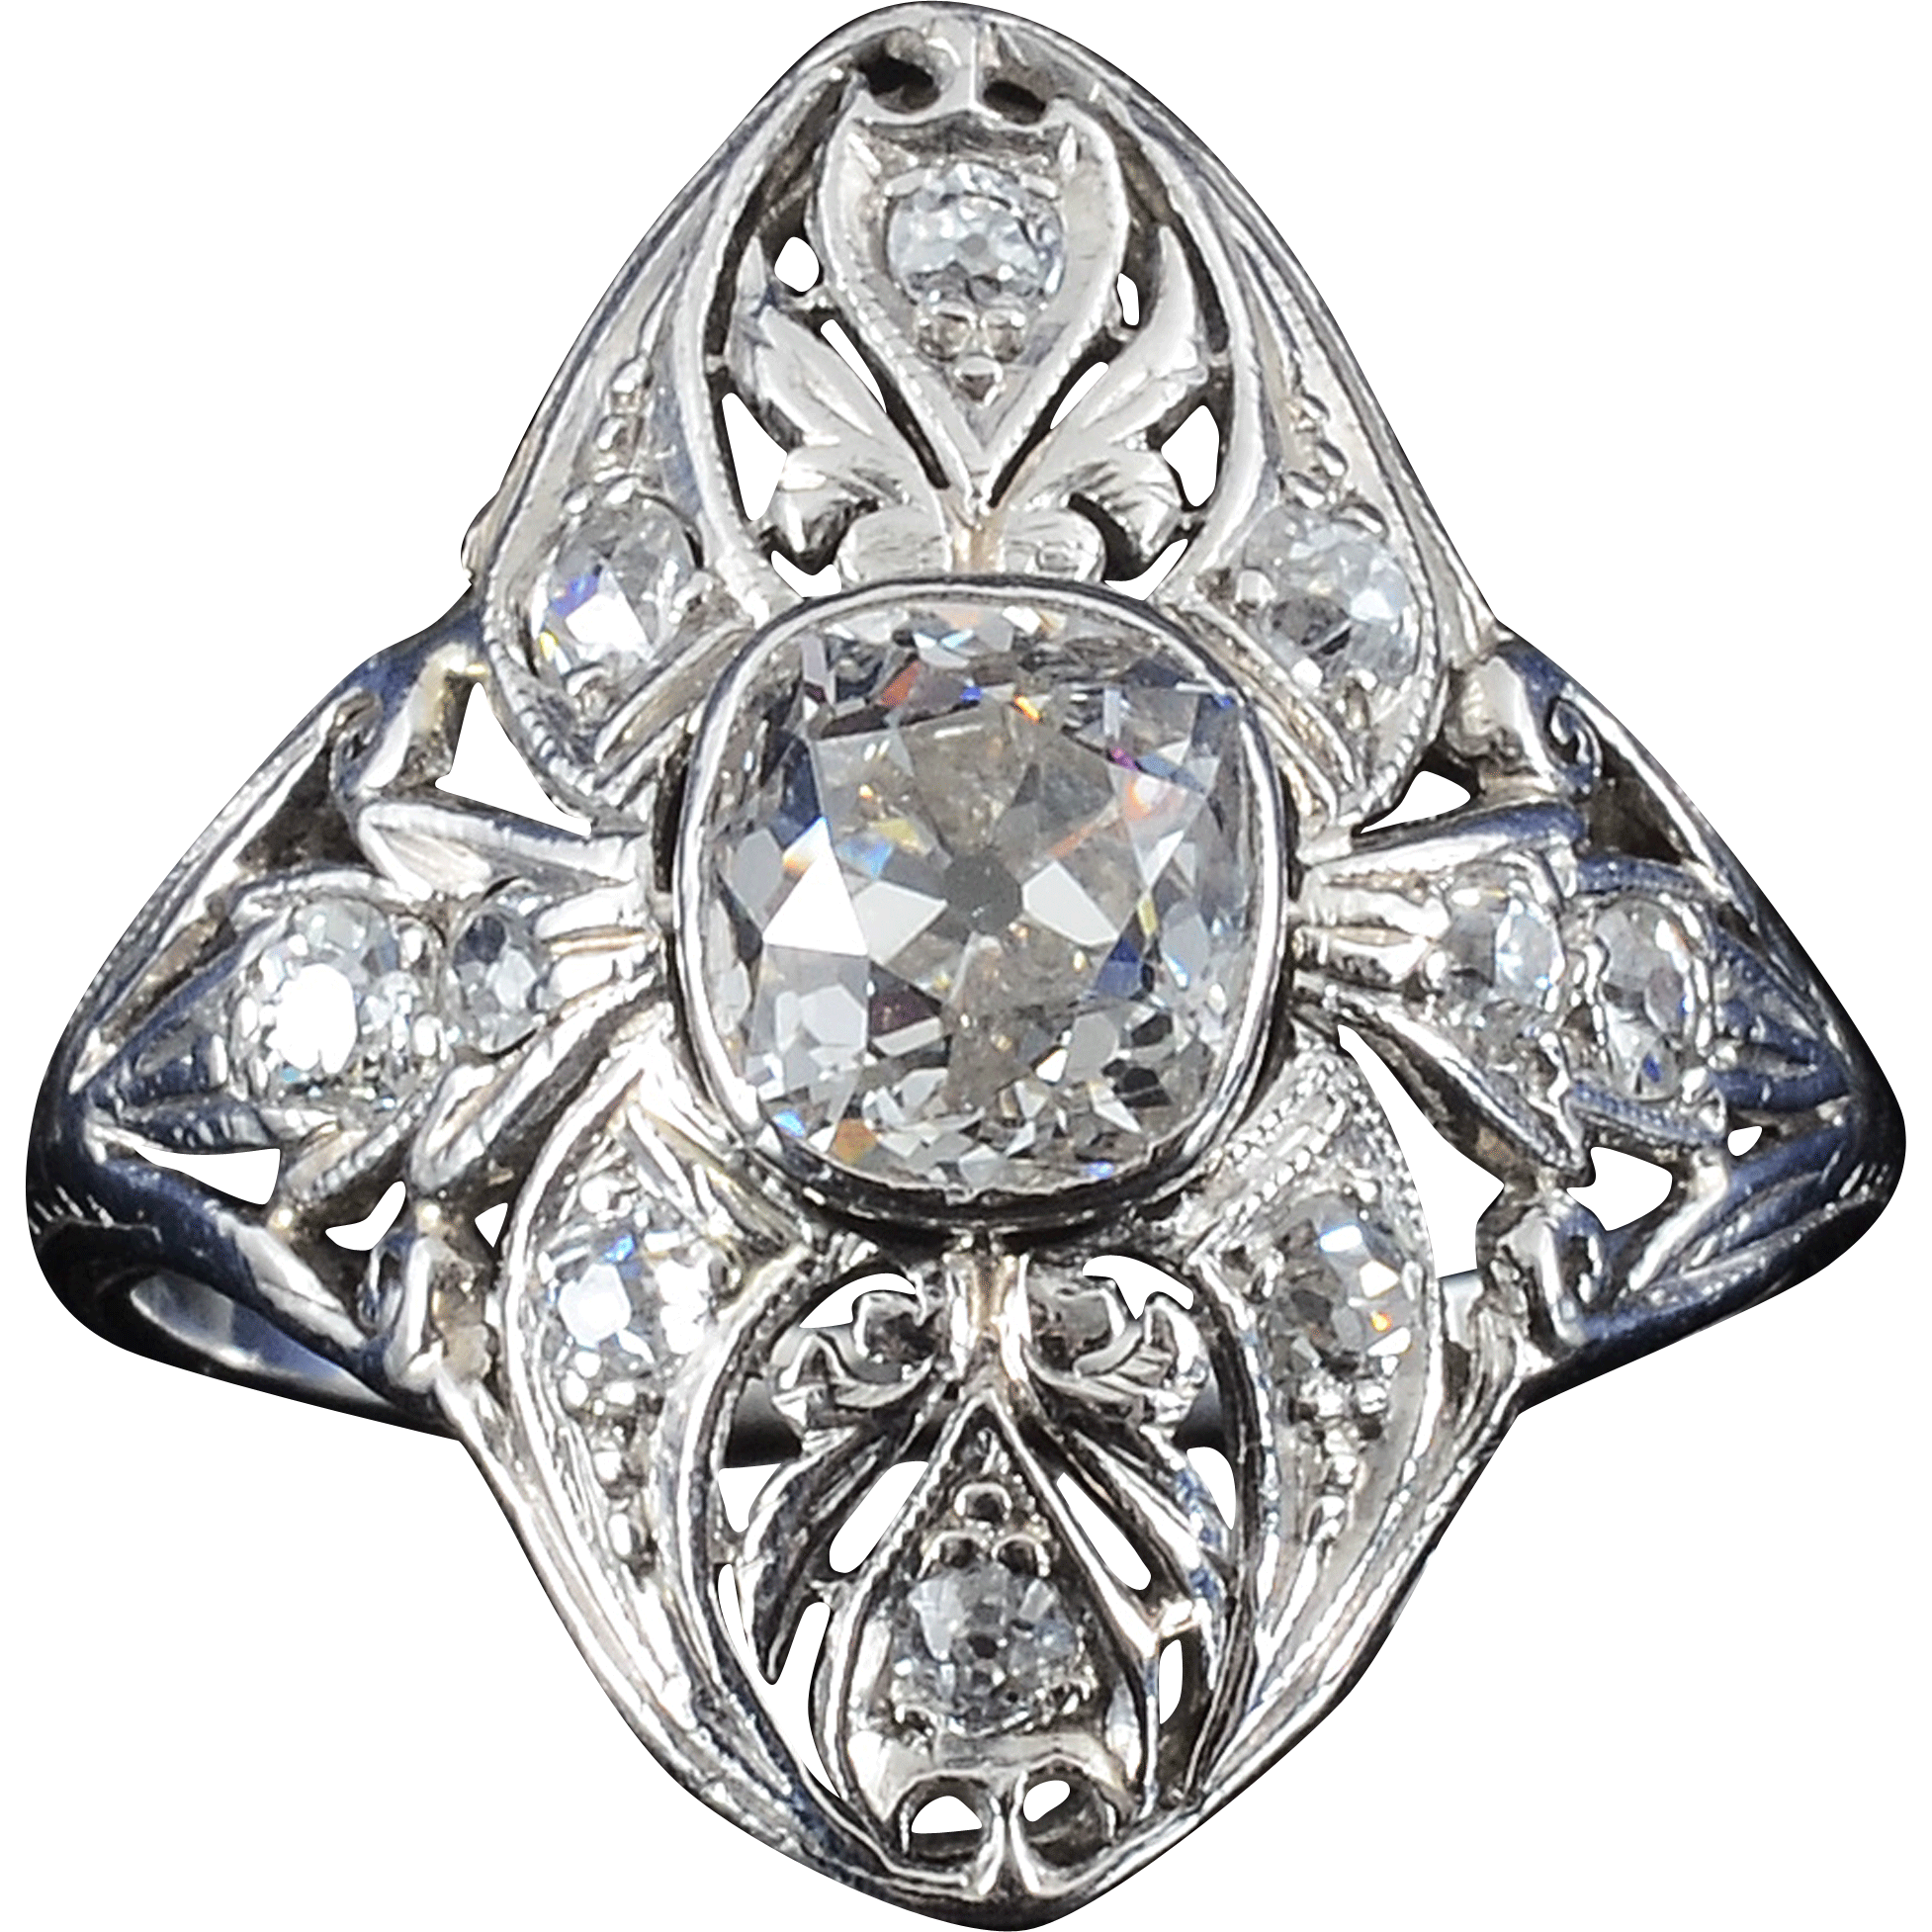 Edwardian Platinum 1.04 Carat Center Diamond Ring